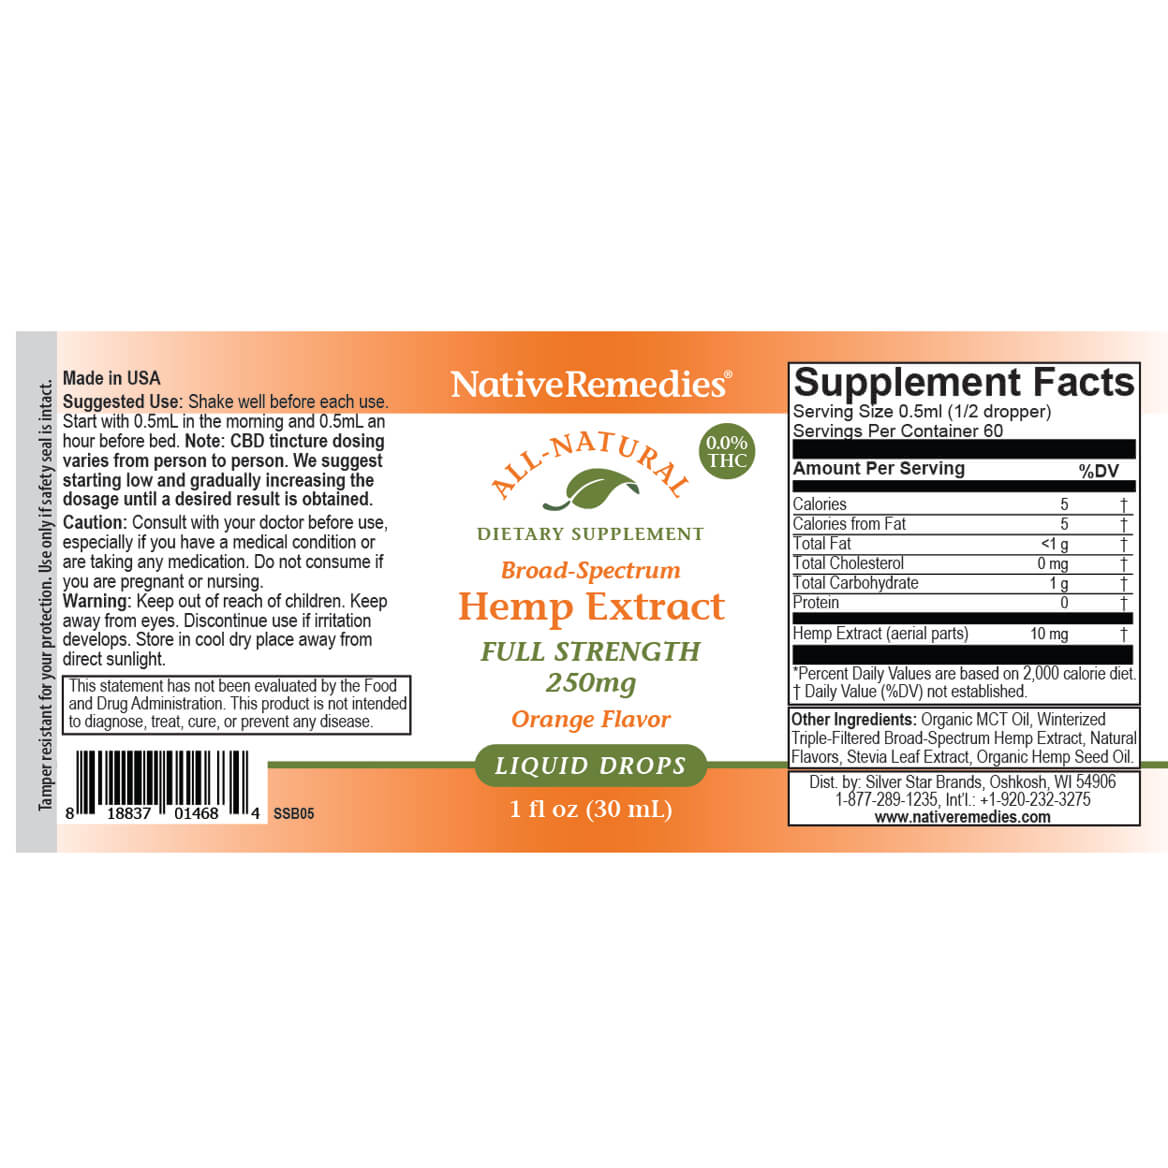 NativeRemedies® Full-Strength Hemp Extract 250 mg-367949